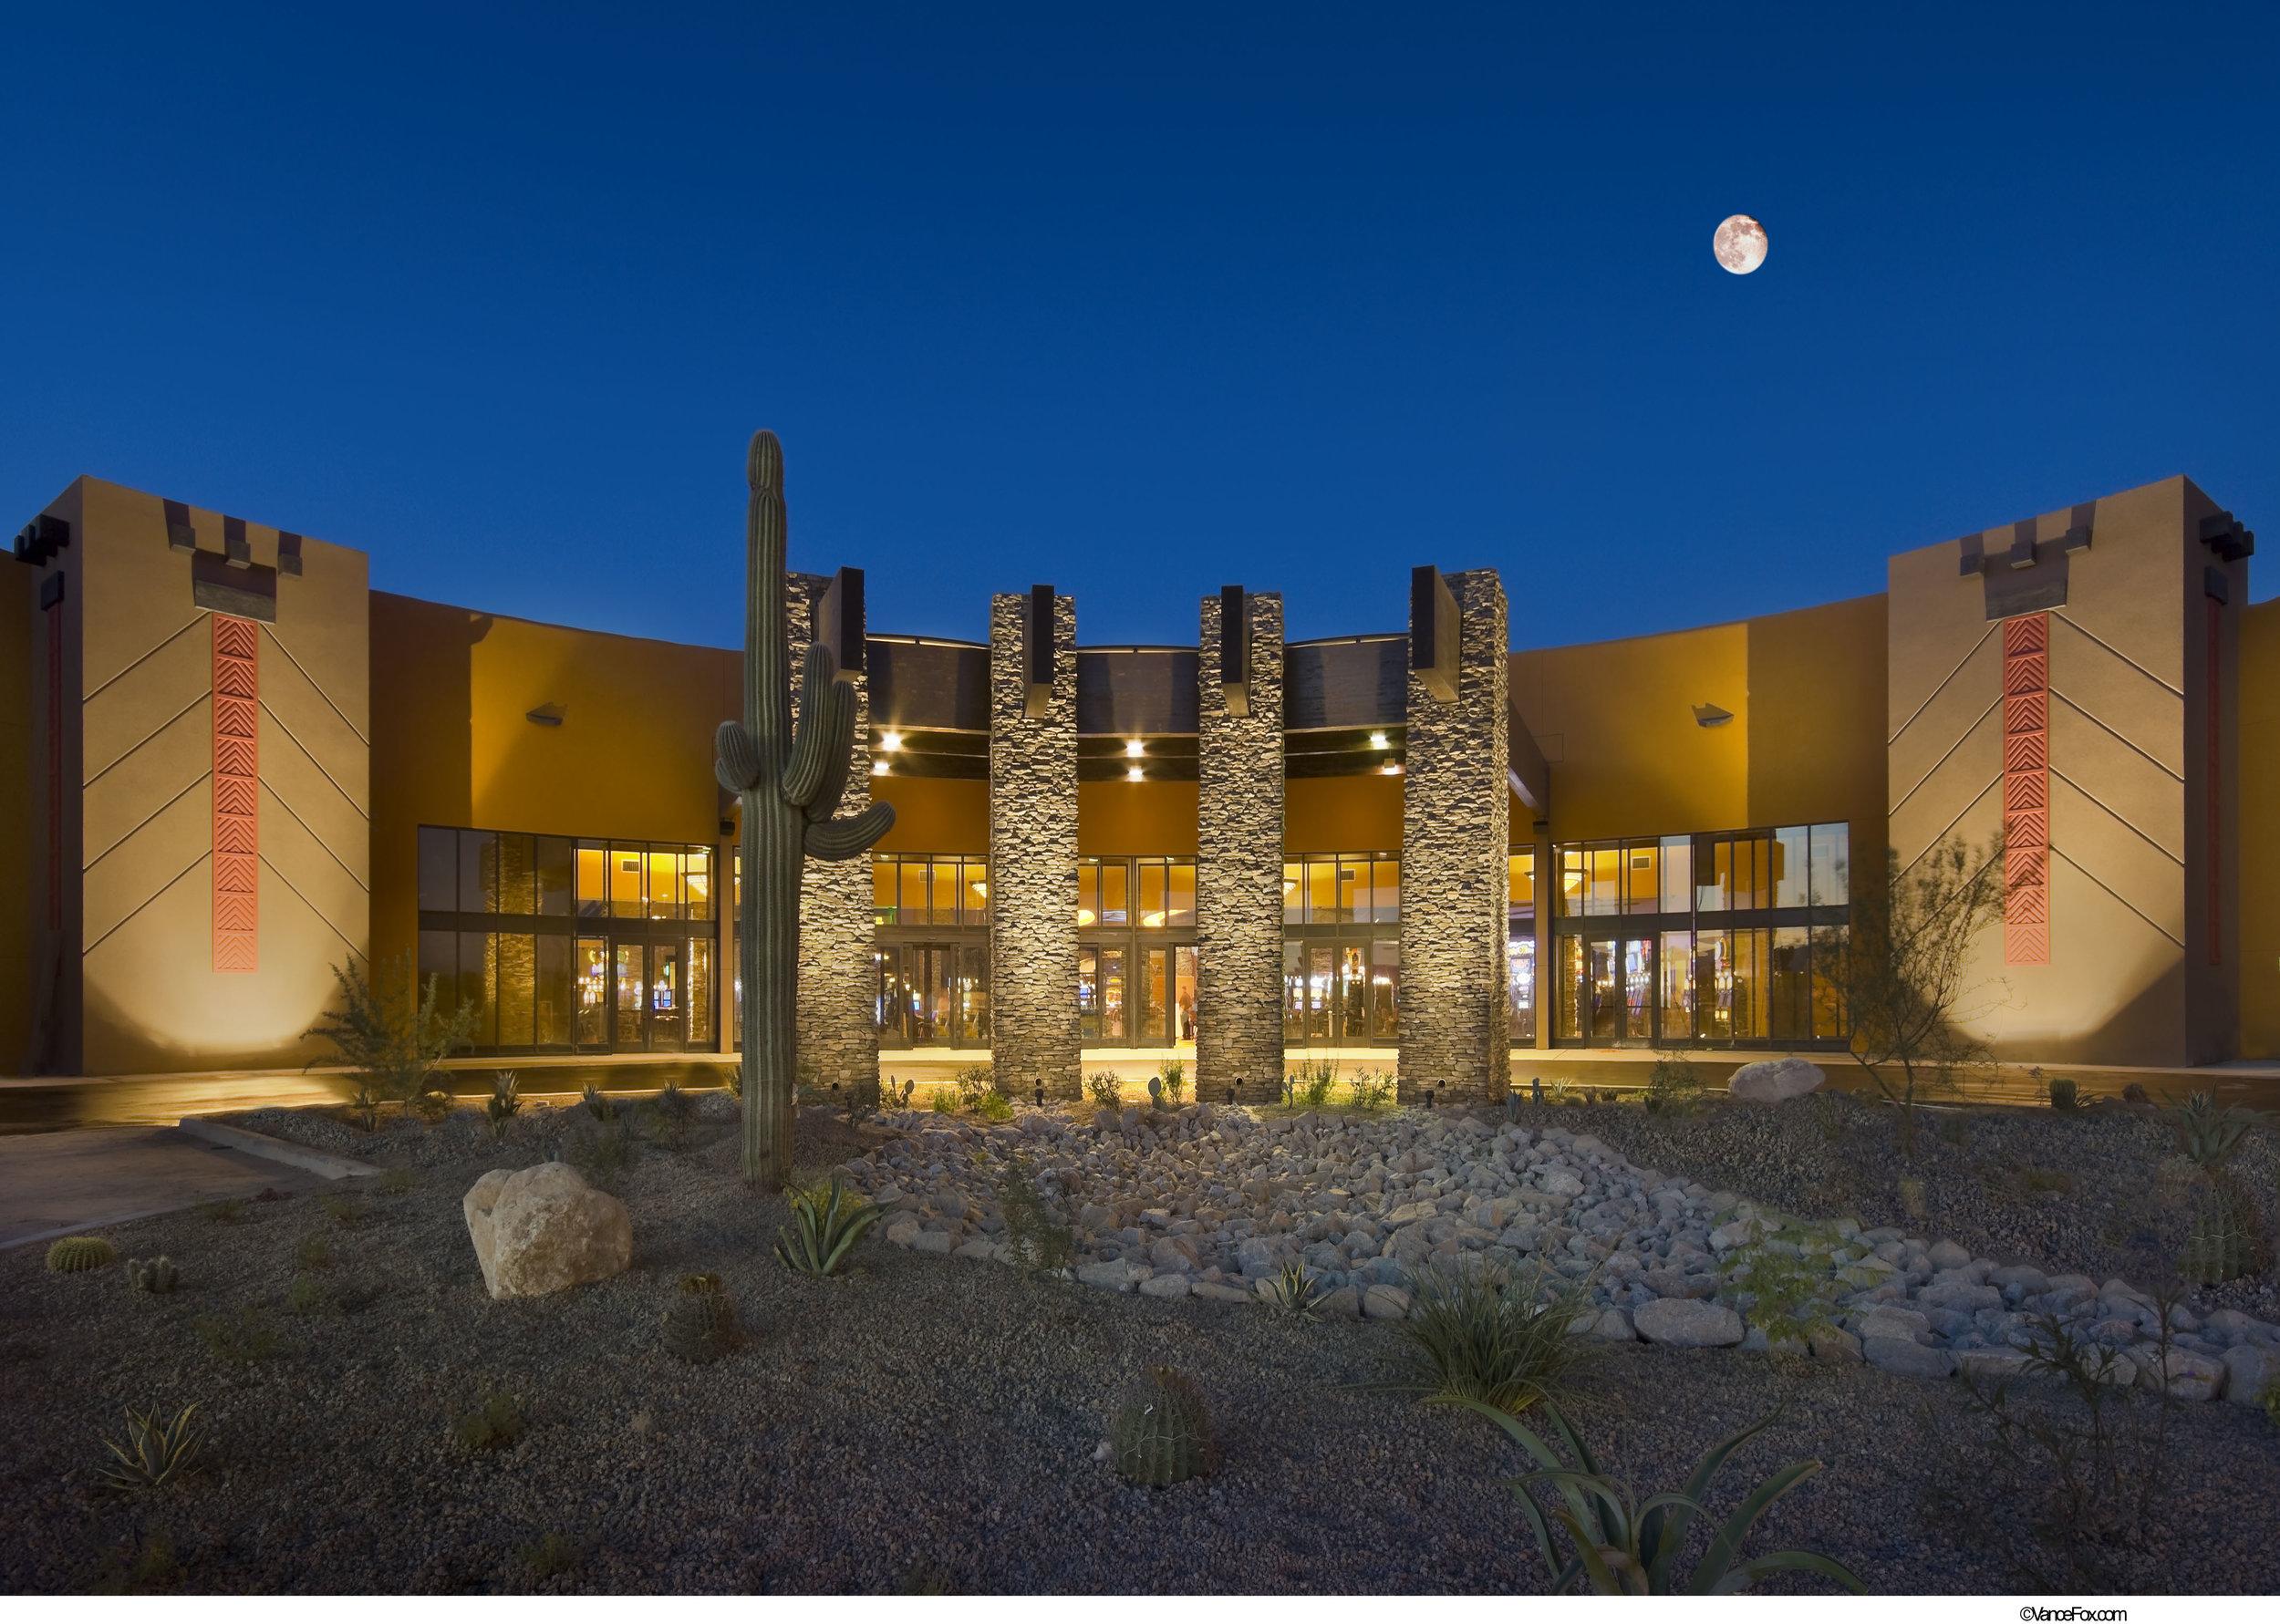 DESERT DIAMOND HOTEL & CASINO    NOGALAS HWY - TUCSON, AZ